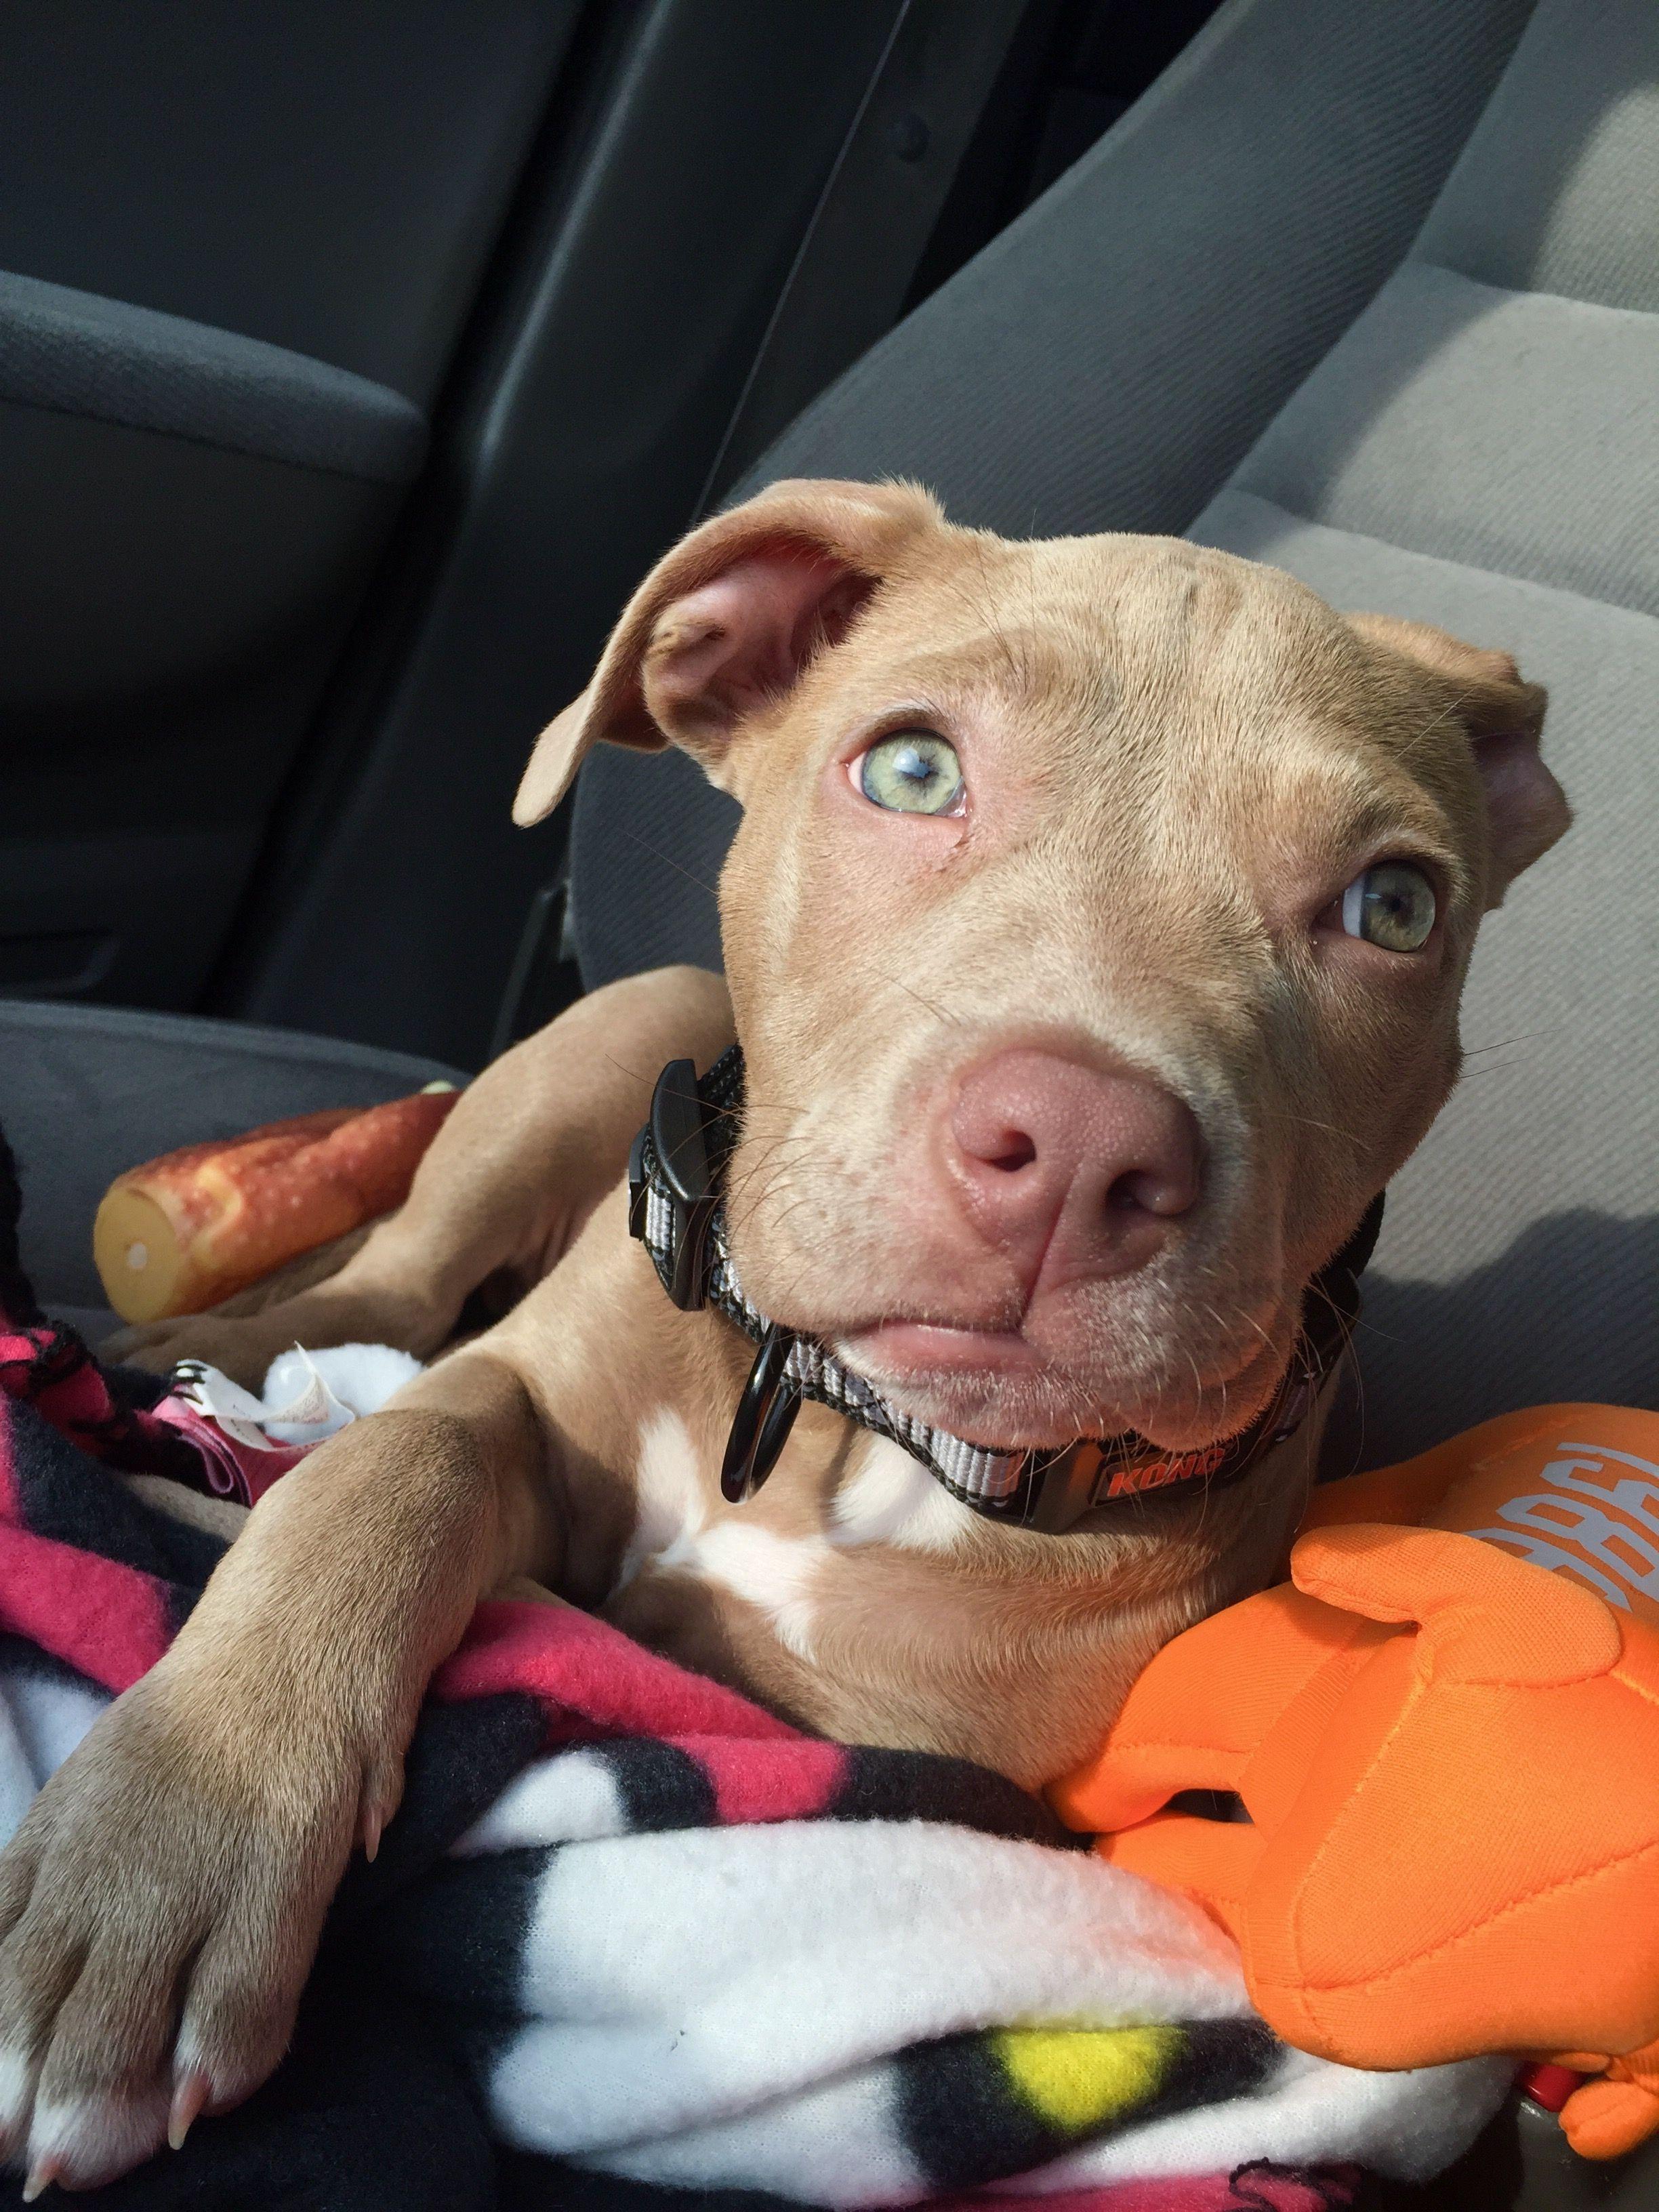 My Baby Cali Bully Razoredge Pitbull Puppy Fawn Blueeyes Perfection Red Nose Pitbull Puppies Pitbull Puppy Nanny Dog